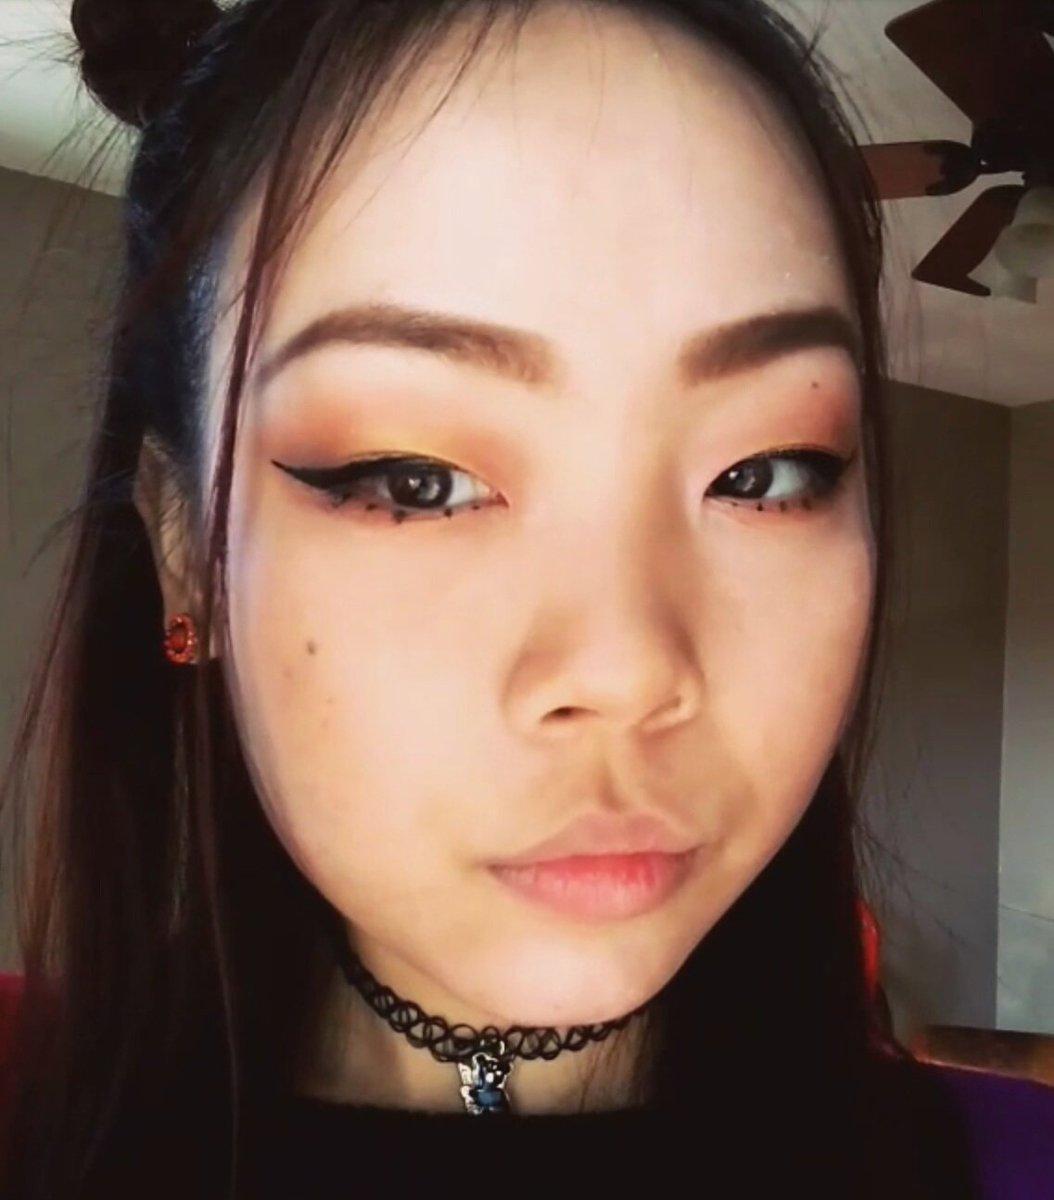 A glance on what&#39;s next   #makeup #lifestyleblog #fashion #fashionblogger #tutorial #youtube #eyeshadow #fallmakeup #sephora #cateye<br>http://pic.twitter.com/PJTdU9pYY1